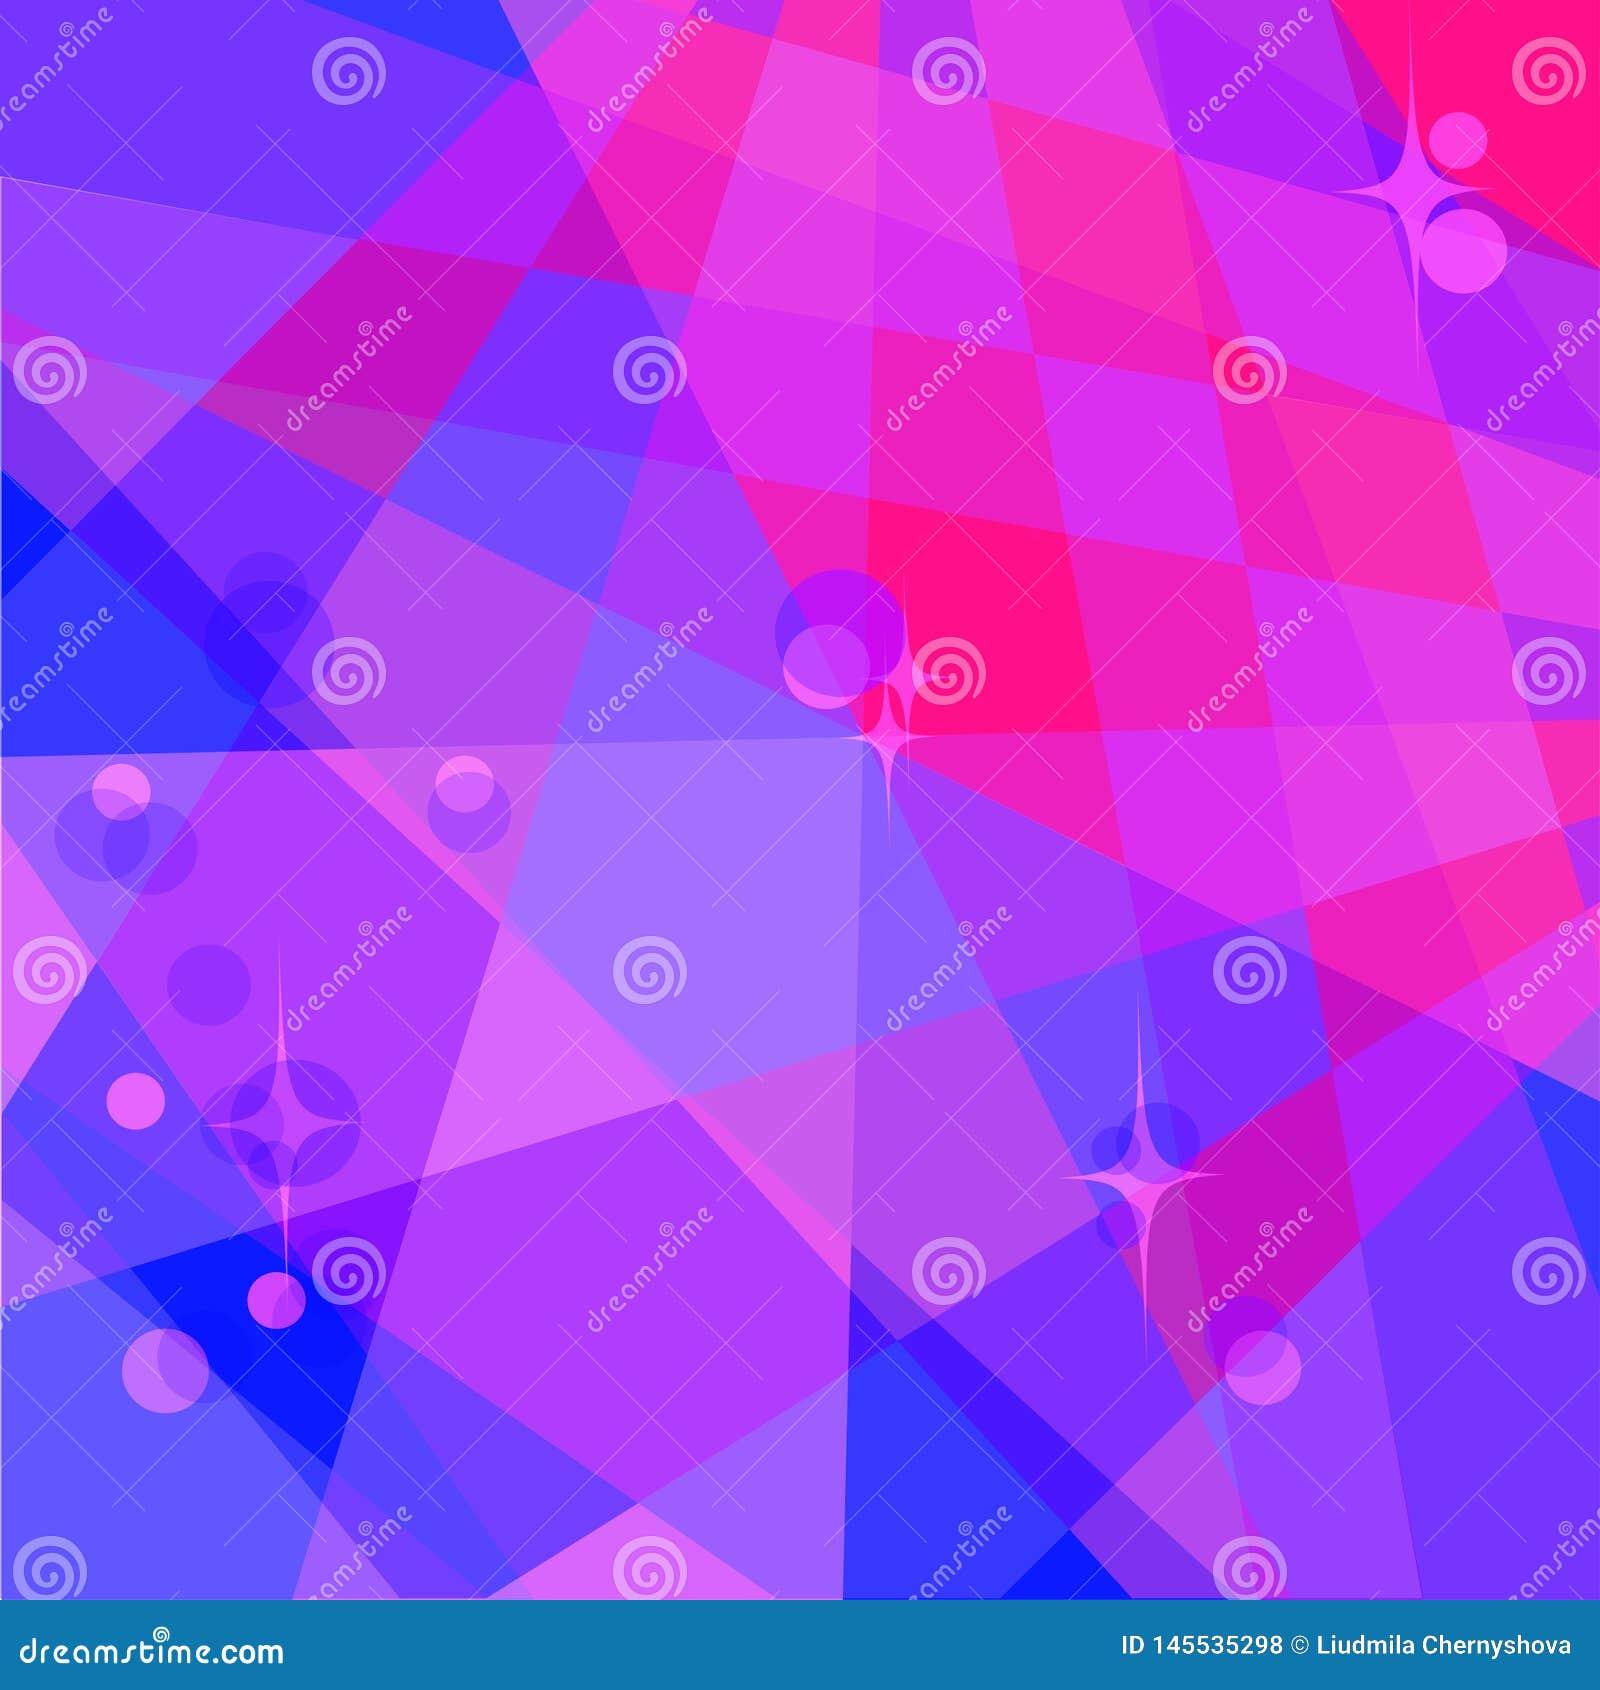 Palette Of Different Futuristic Neon Color Vaporwave Holographic